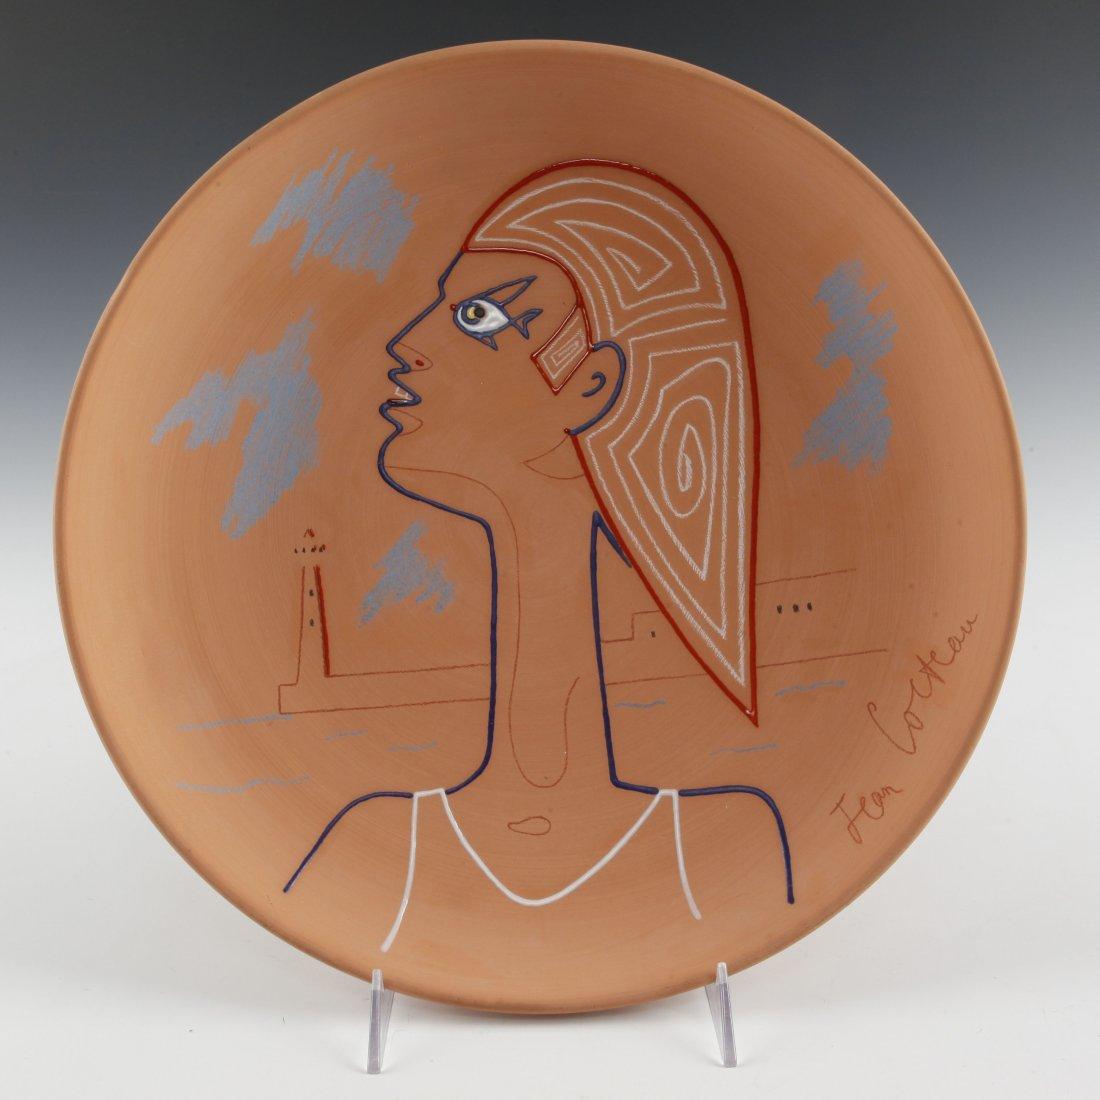 JEAN COCTEAU LARGE CHARGER PLATE MASQUE D'EGYPTIEN